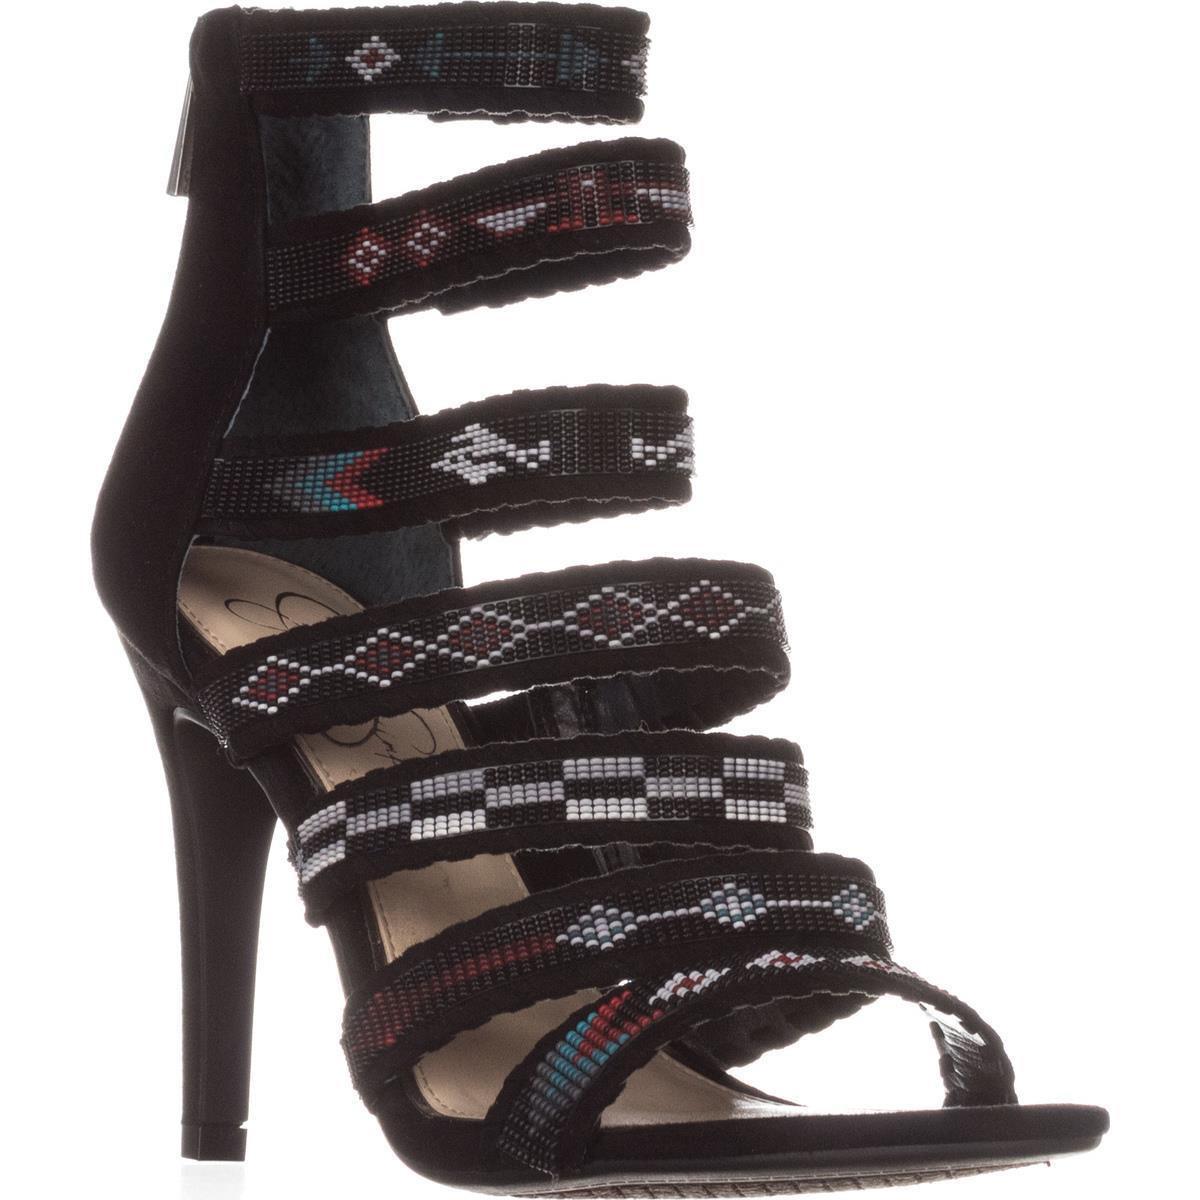 26ecfc953d Jessica Simpson Erienne Strappy Aztec Sandals in Black - Lyst